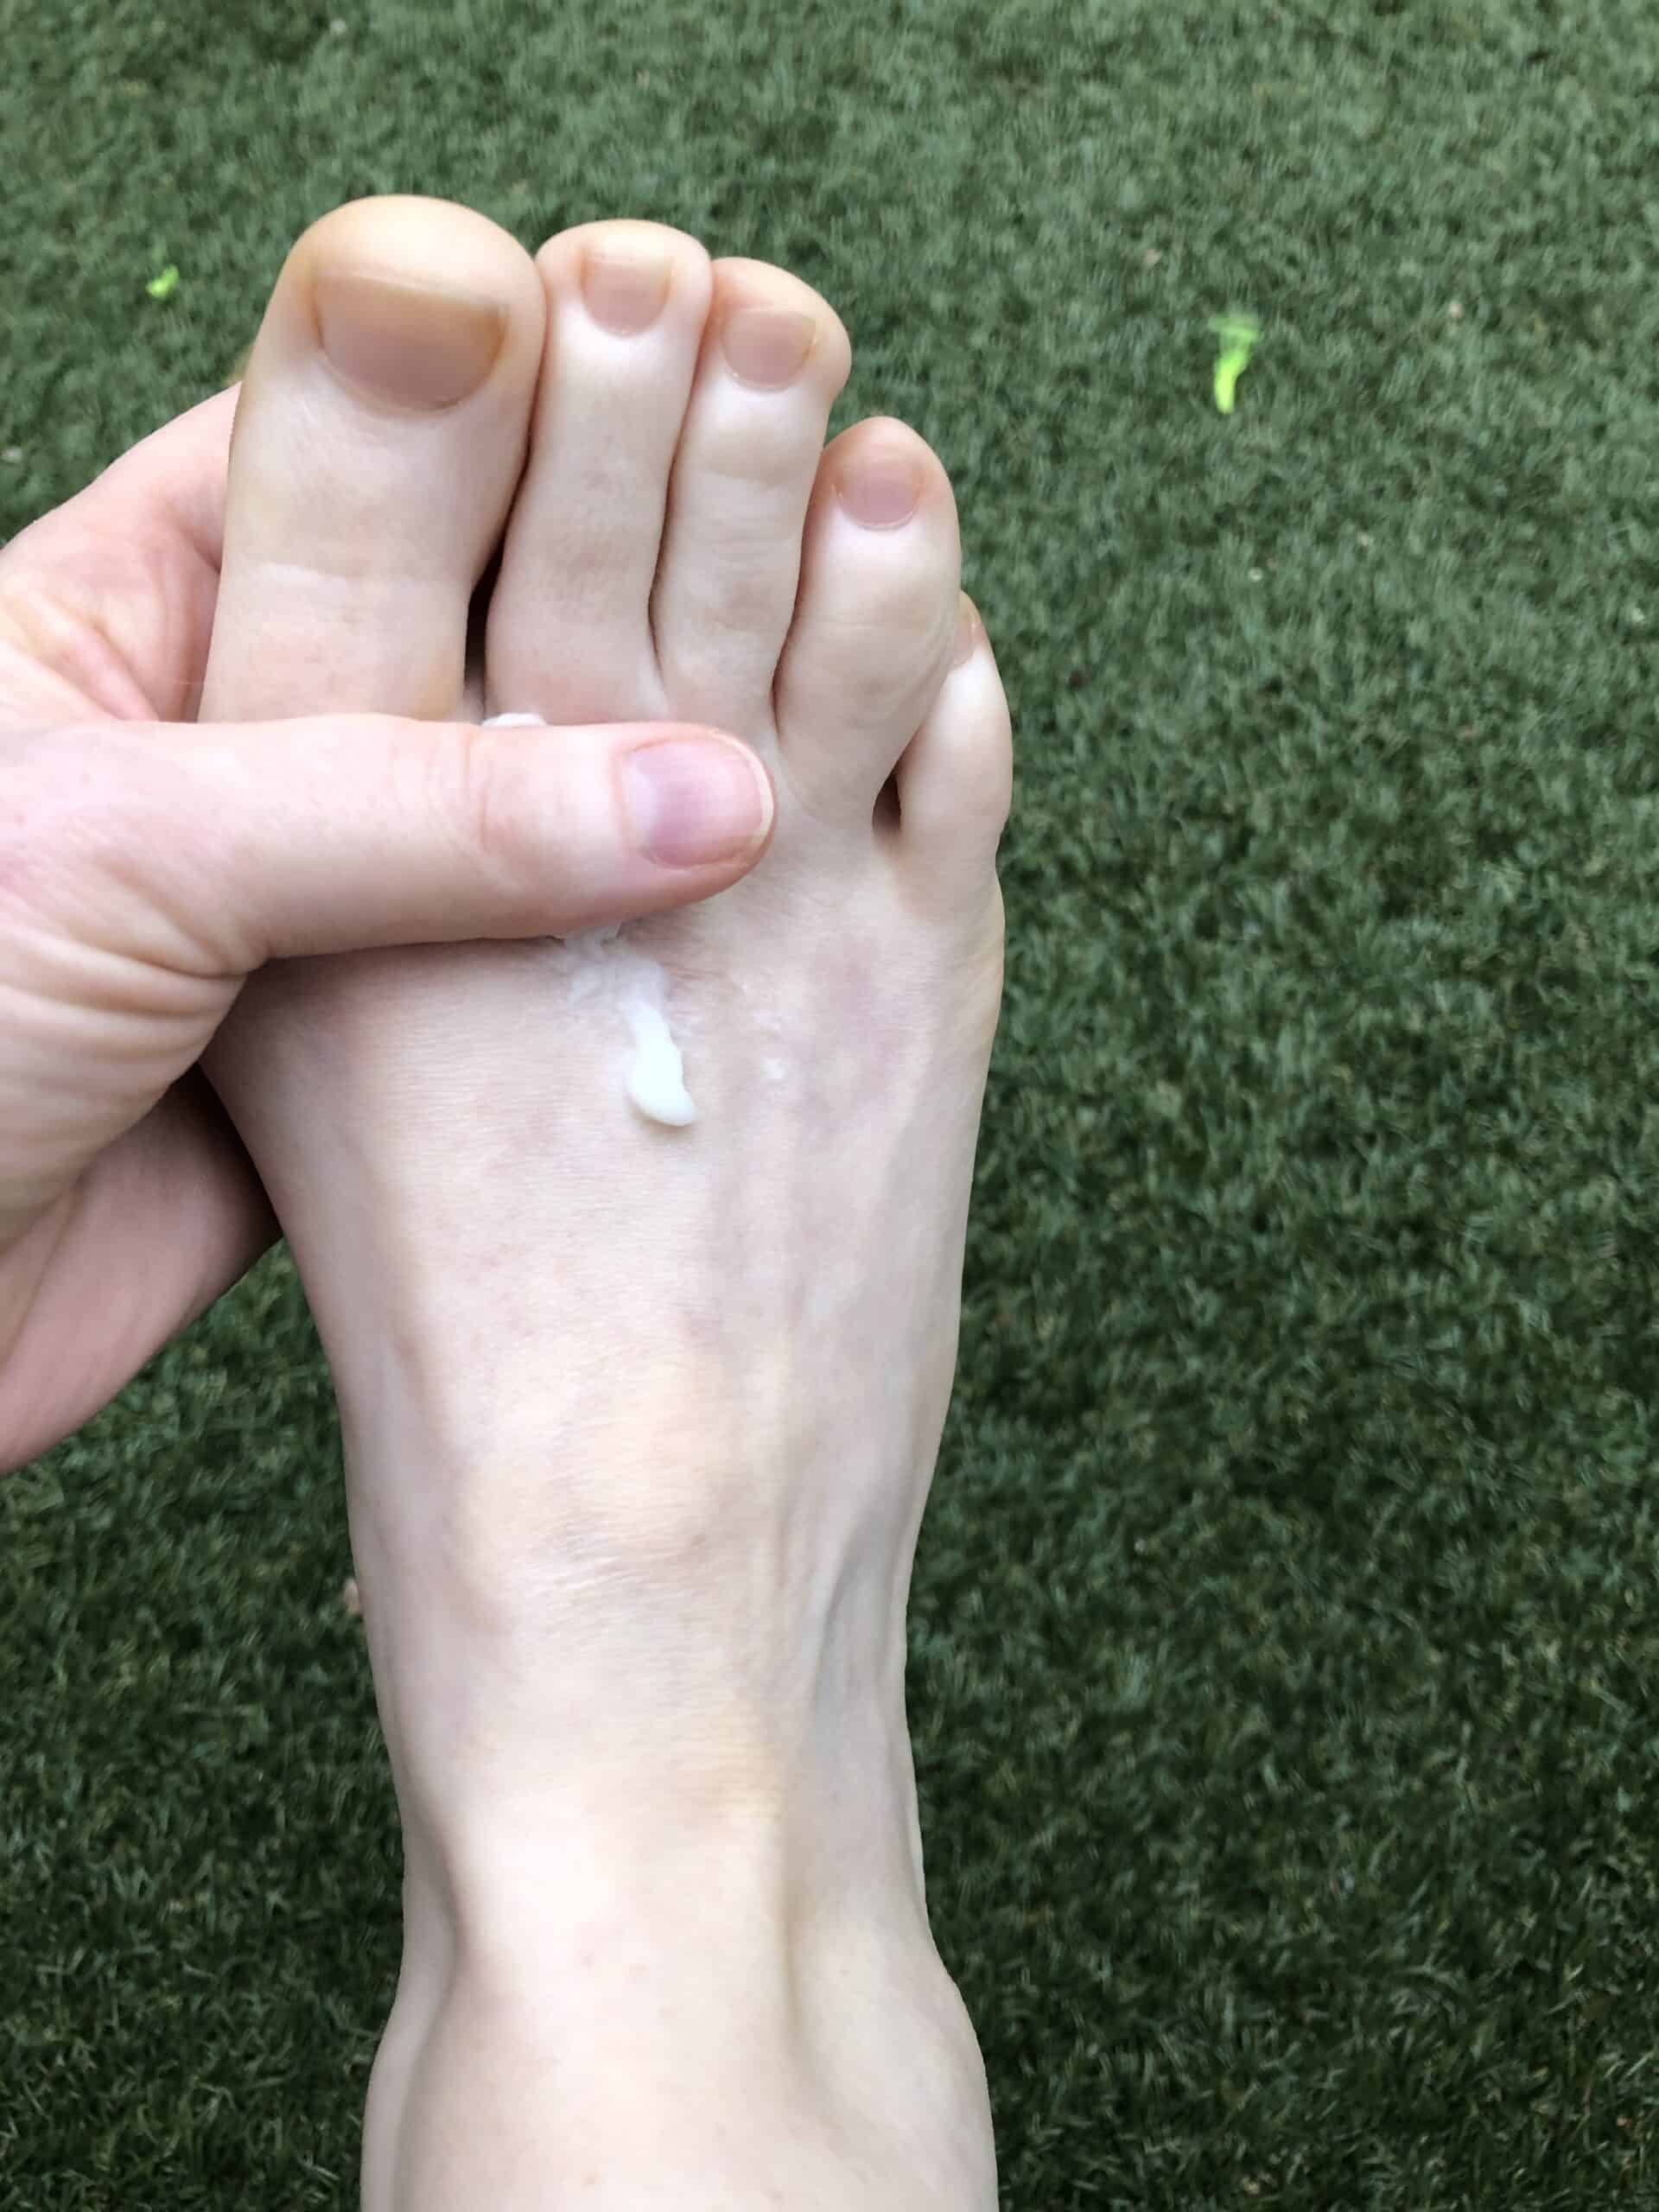 social cbd foot renewal cream save on cannabis testing process